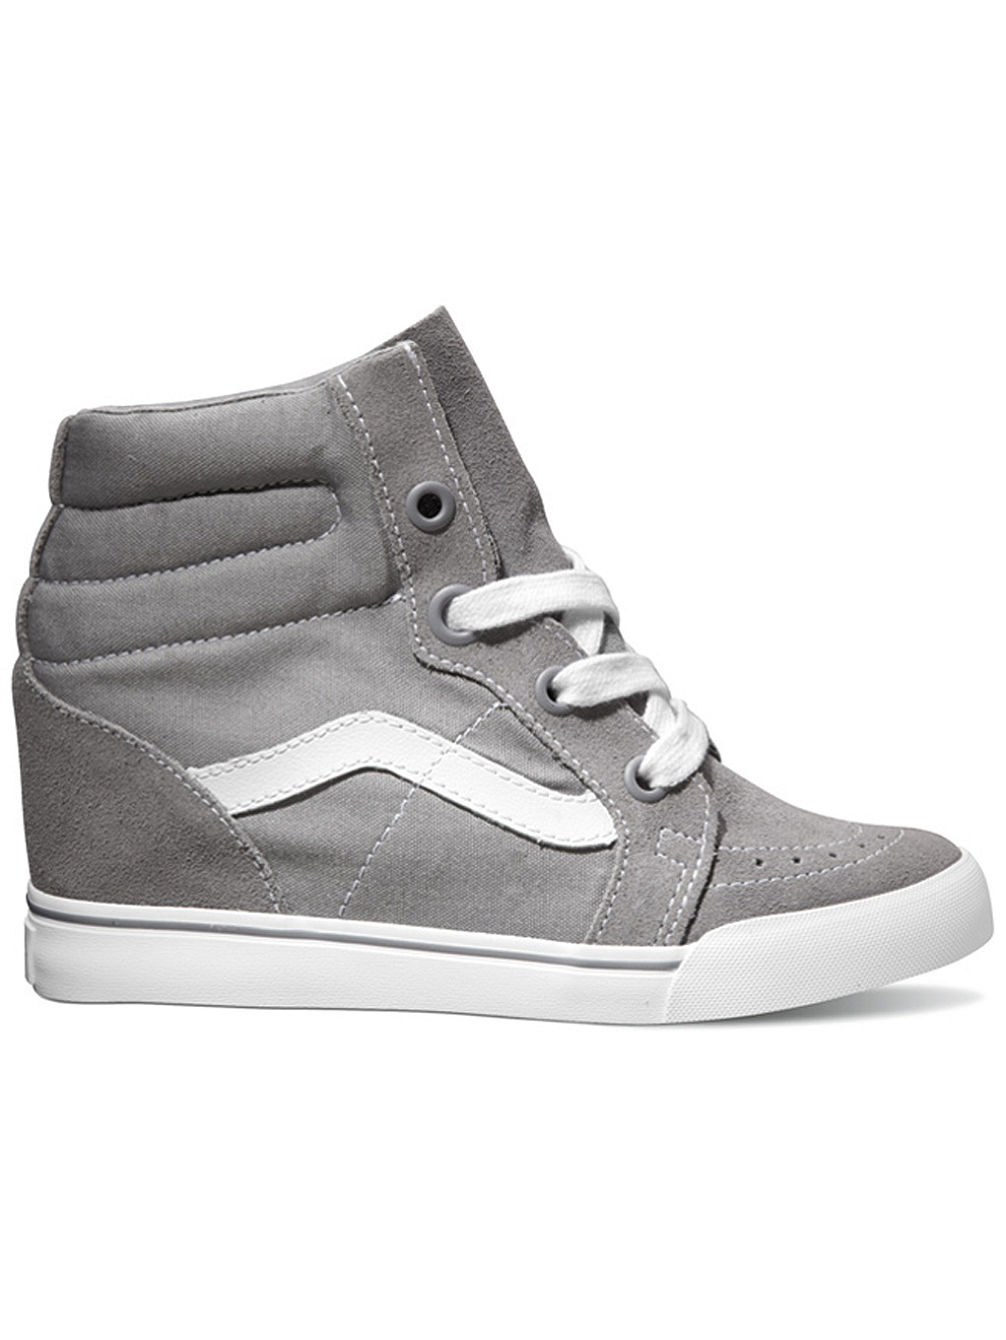 Buy Vans Sk8-Hi Wedge Sneakers online at blue-tomato.com 1926d0ce6e